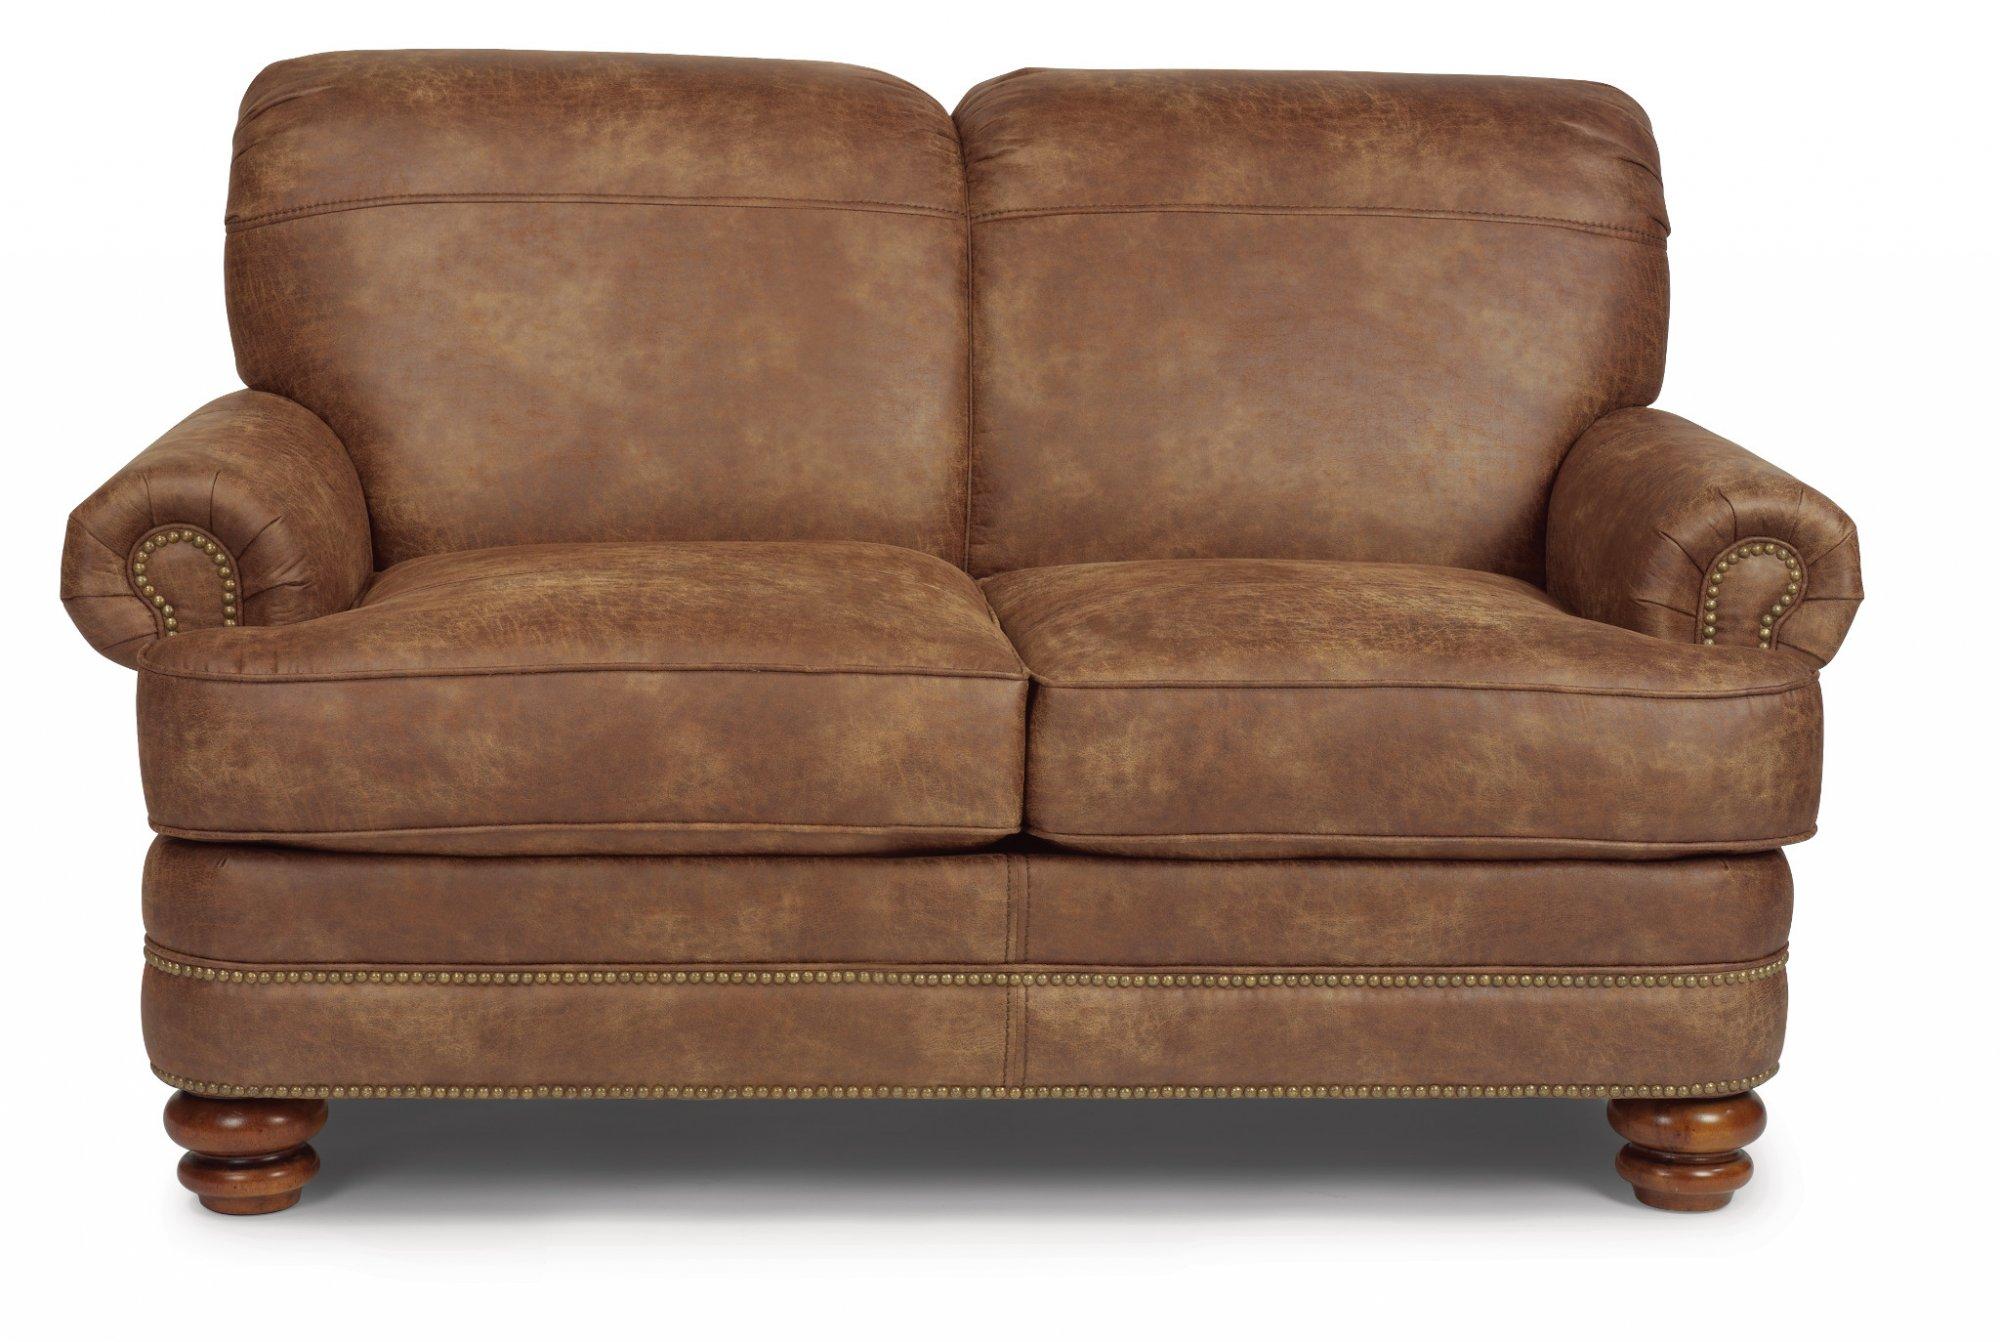 Flexsteel Craig Appliance And Furniture